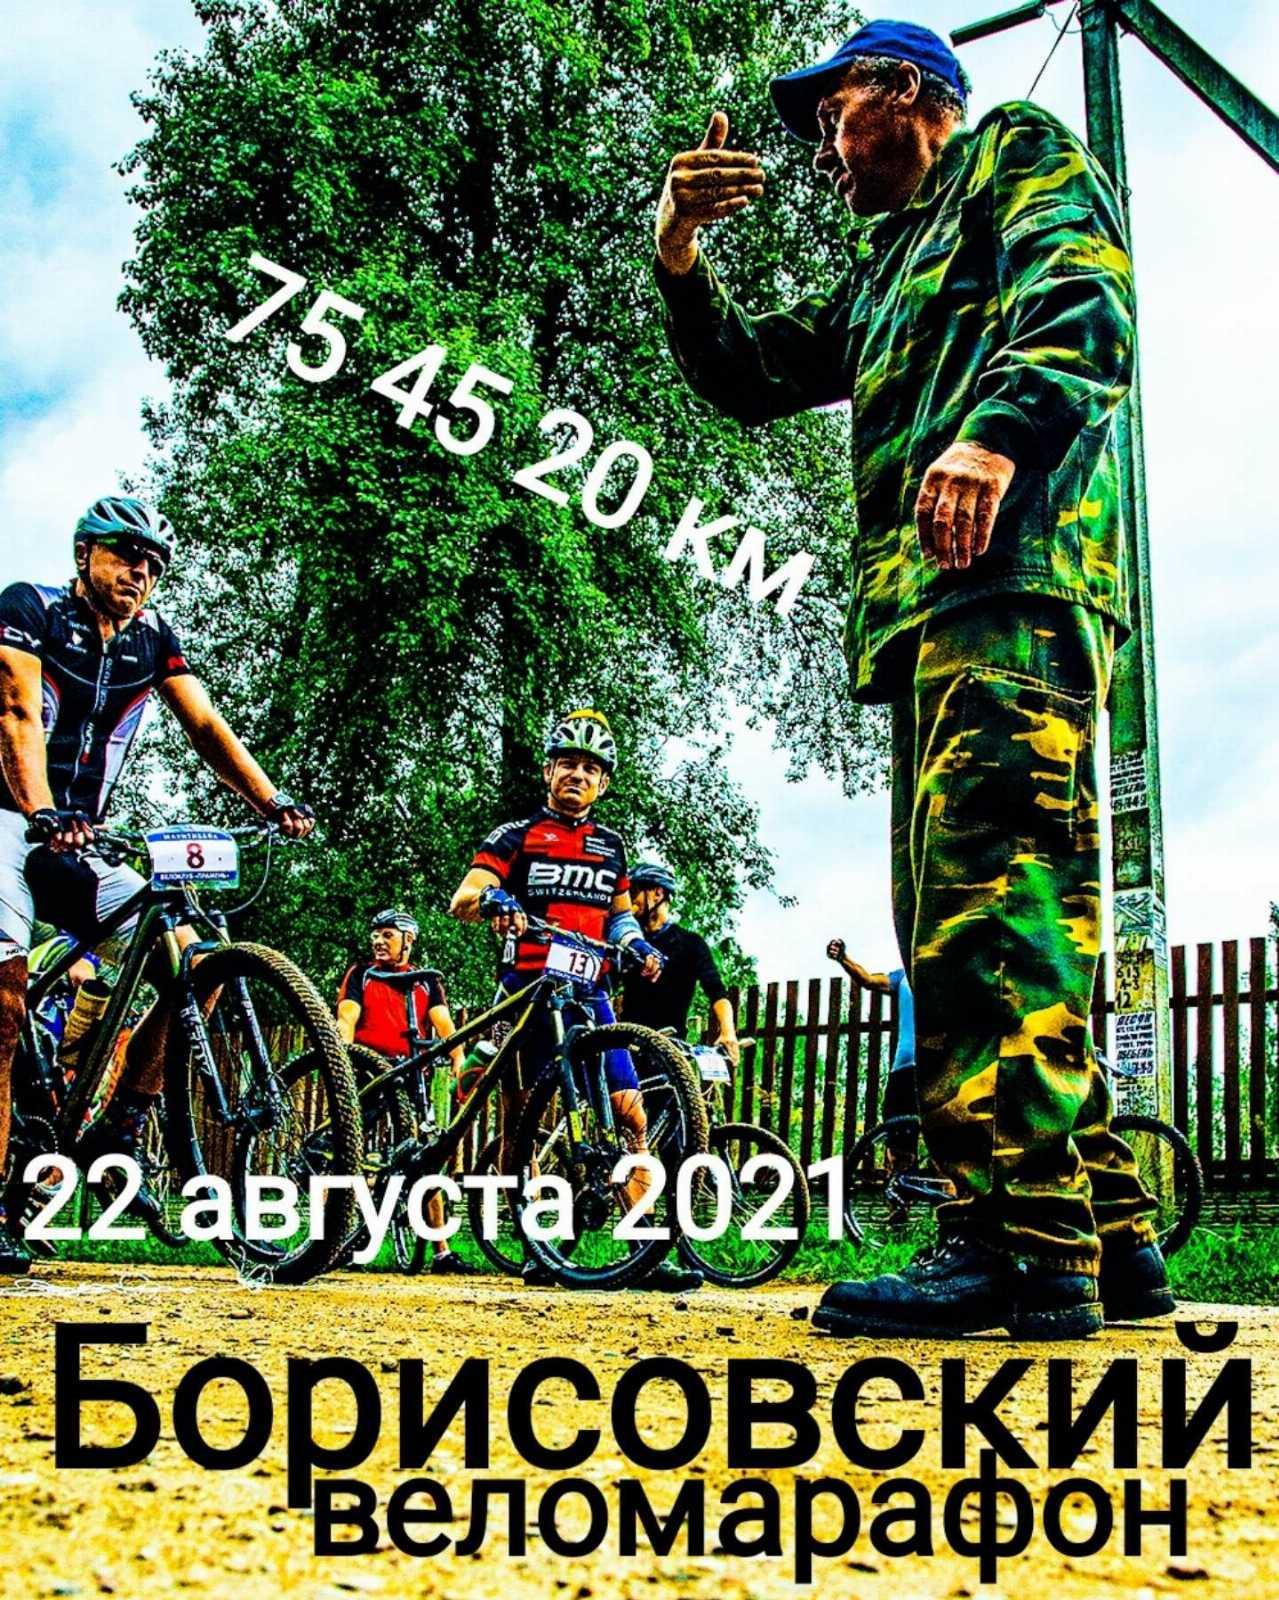 Борисовский веломарафон (NEW!)